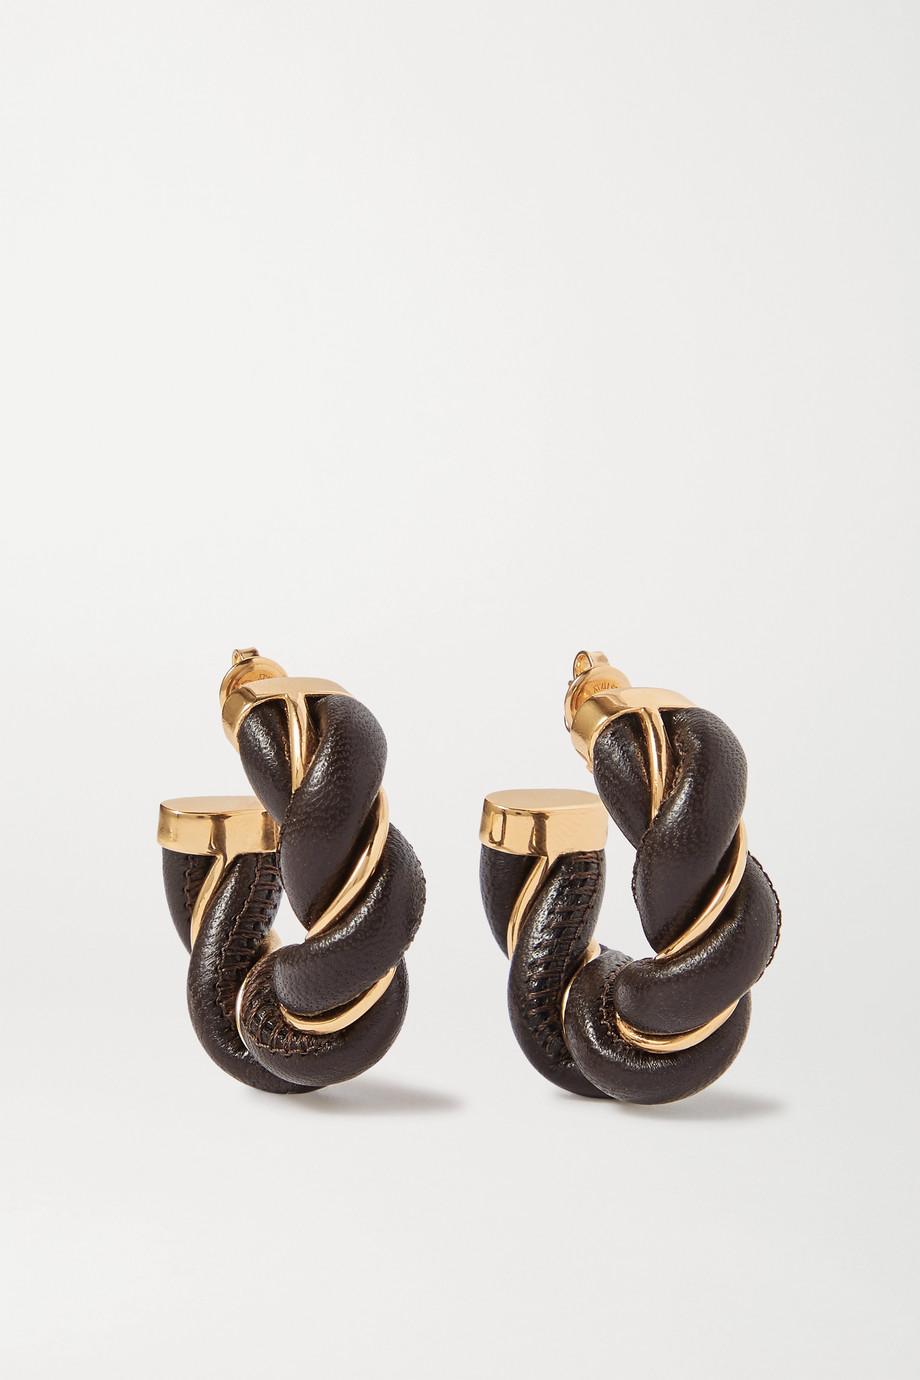 Bottega Veneta Gold-tone and leather hoop earrings